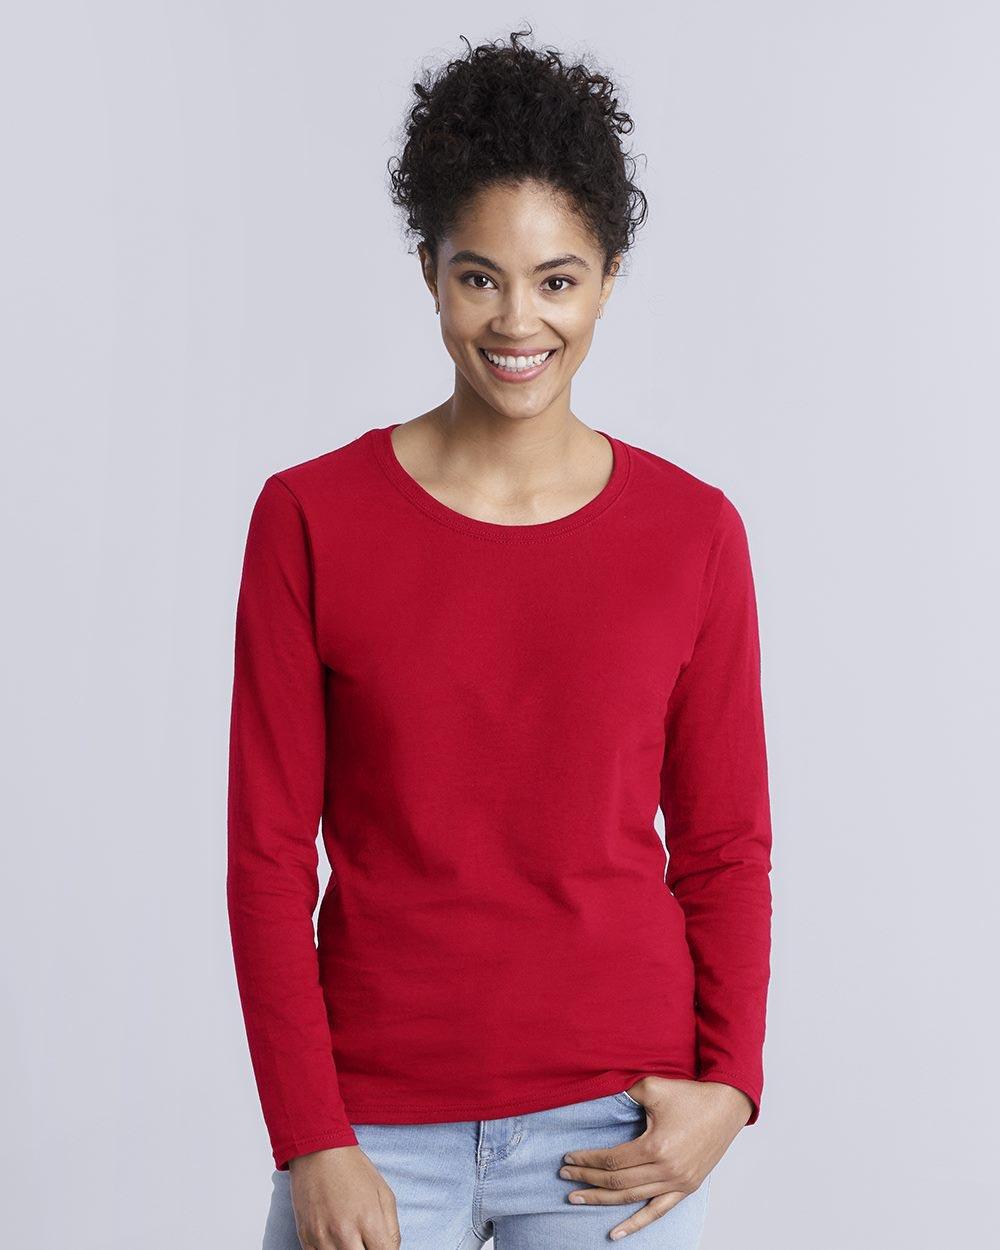 Gildan 5400L - Heavy Cotton Women's Long Sleeve T-Shirt